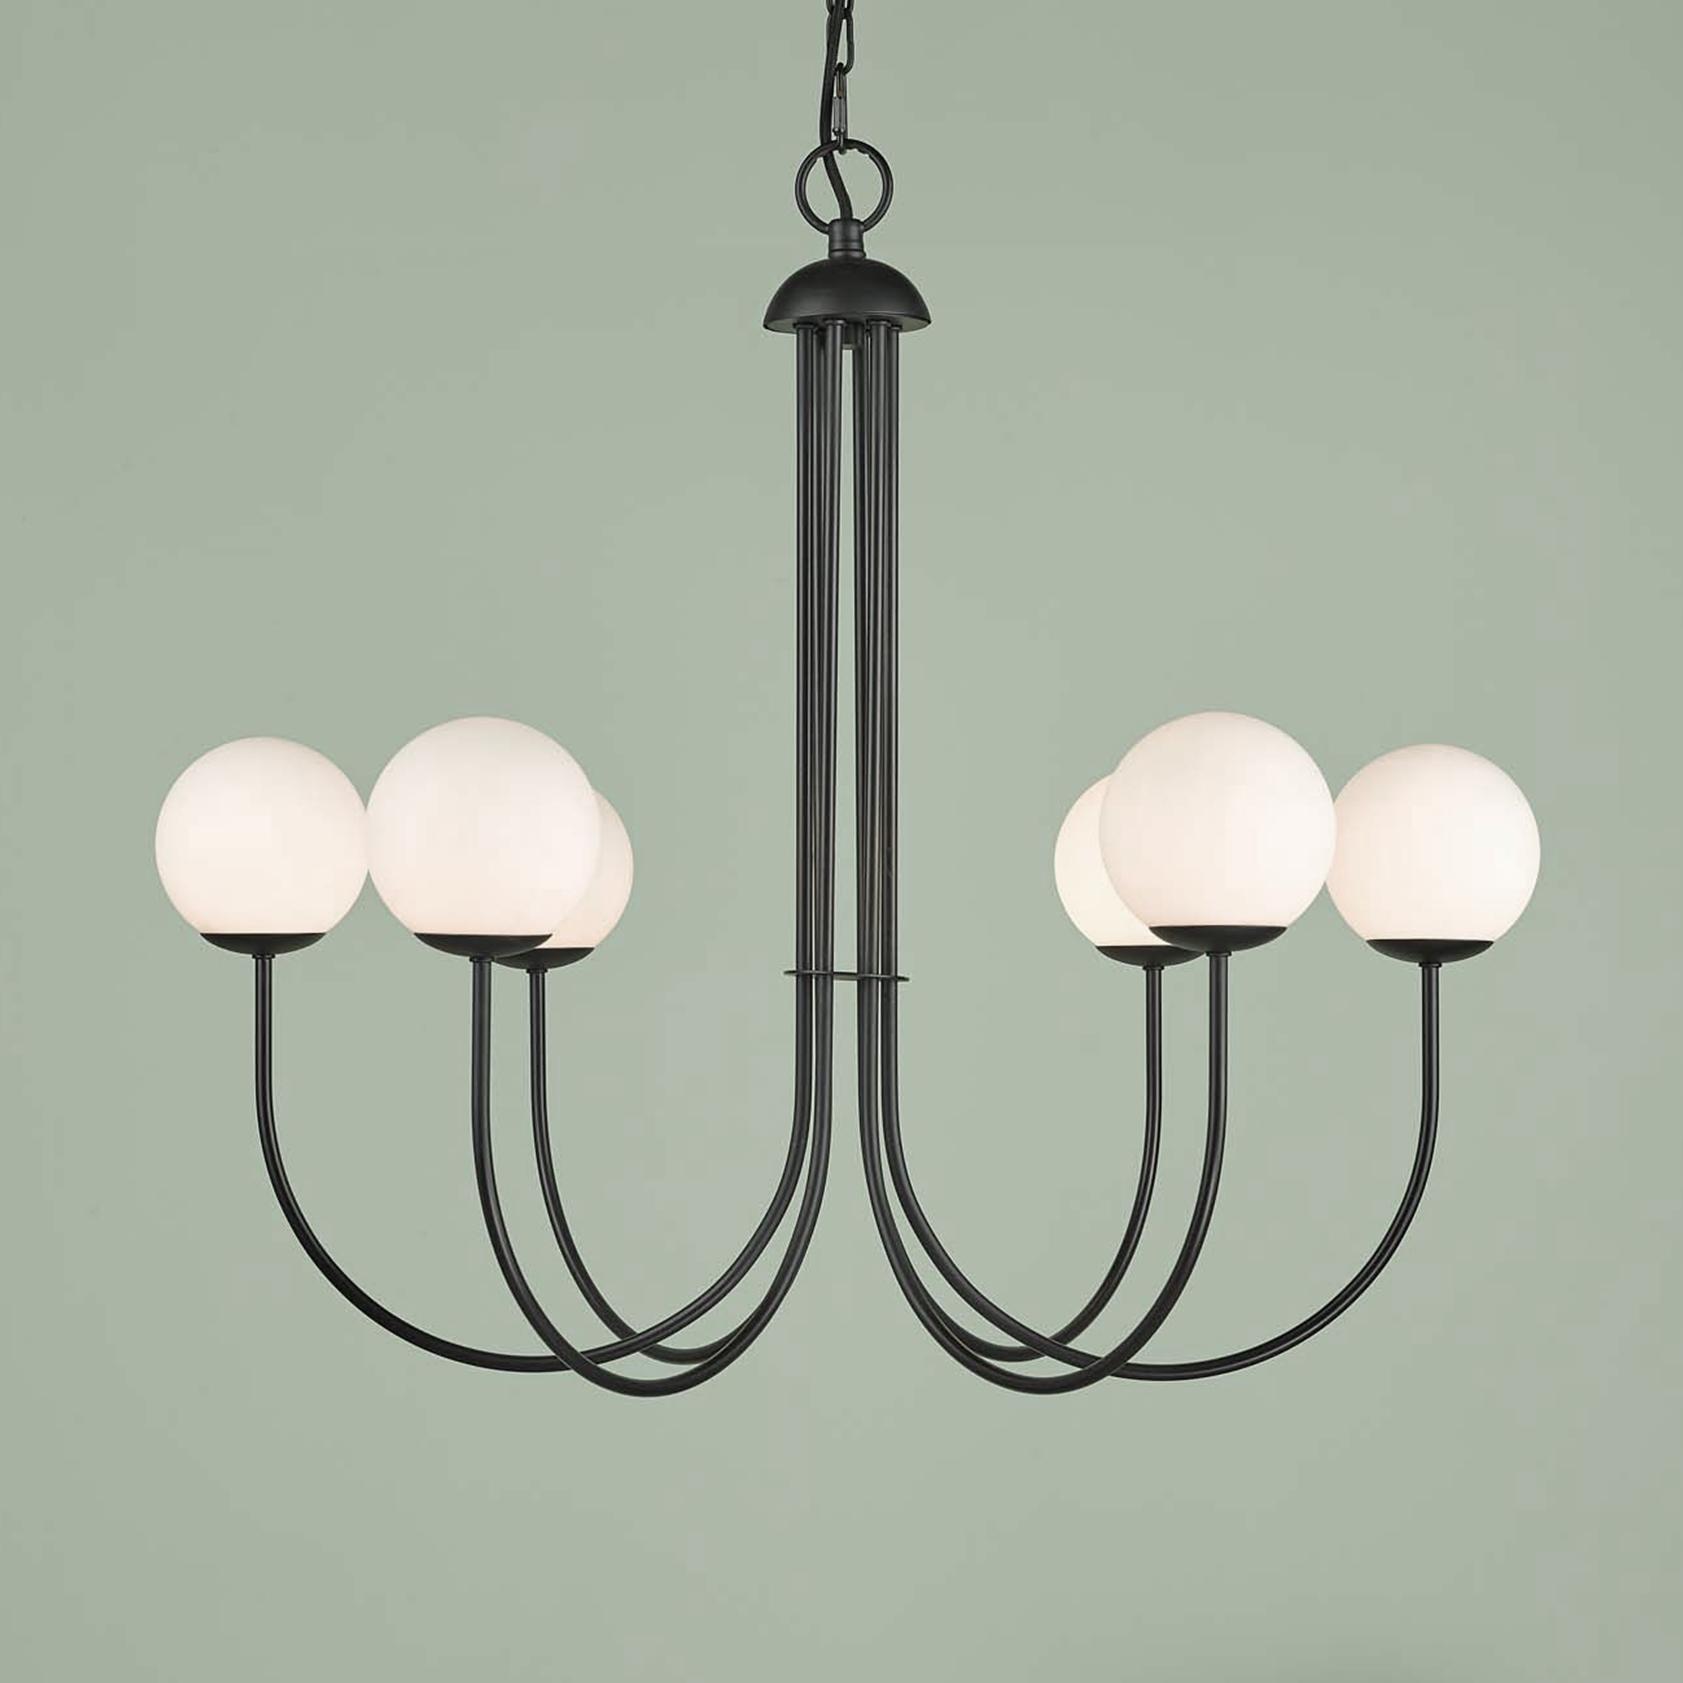 Chandelier Pendant Light Lamp Lighting Simple Nordic Style